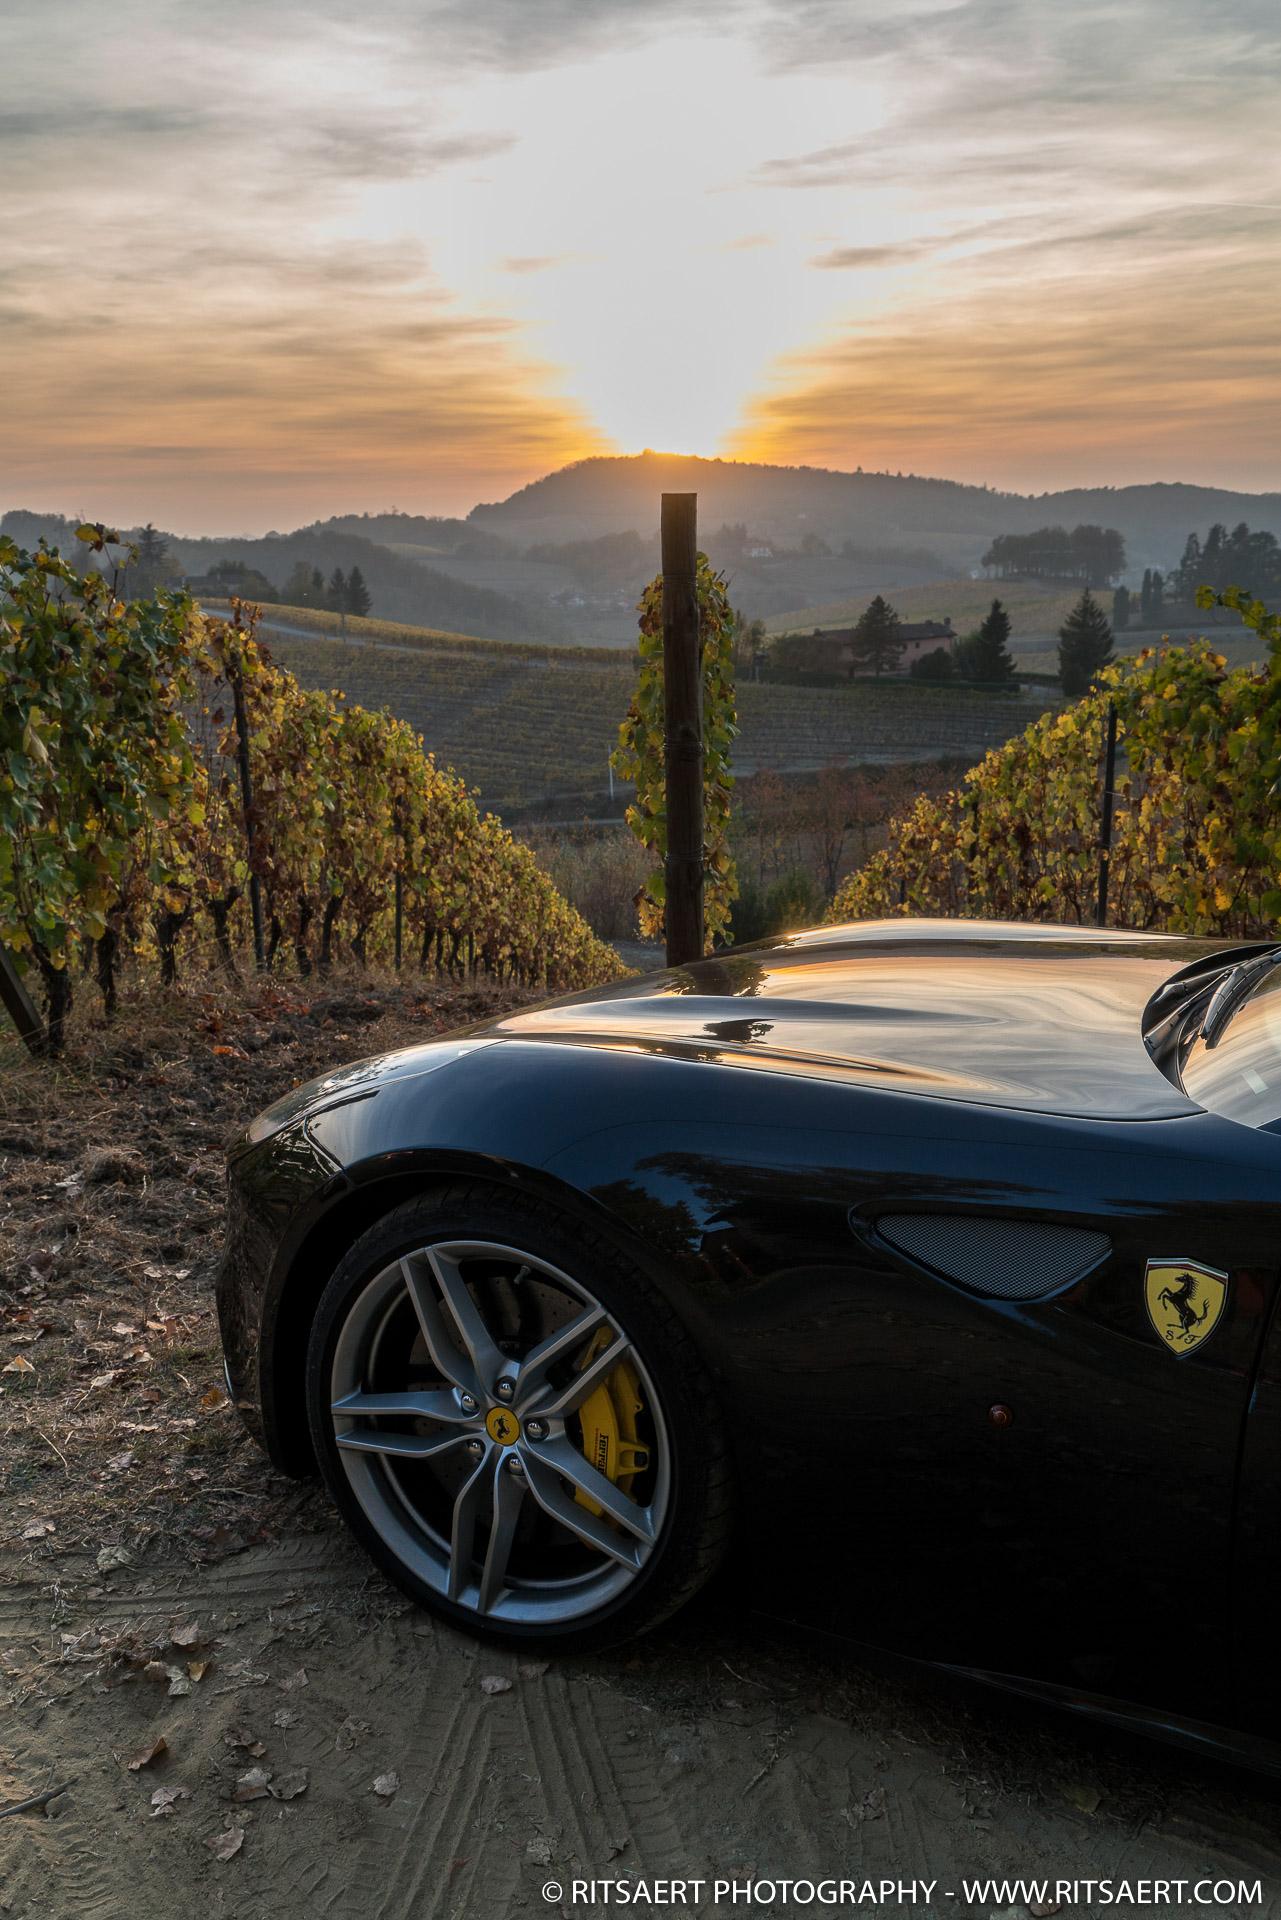 Sunset - Ferrari FF - near Milan - Italy